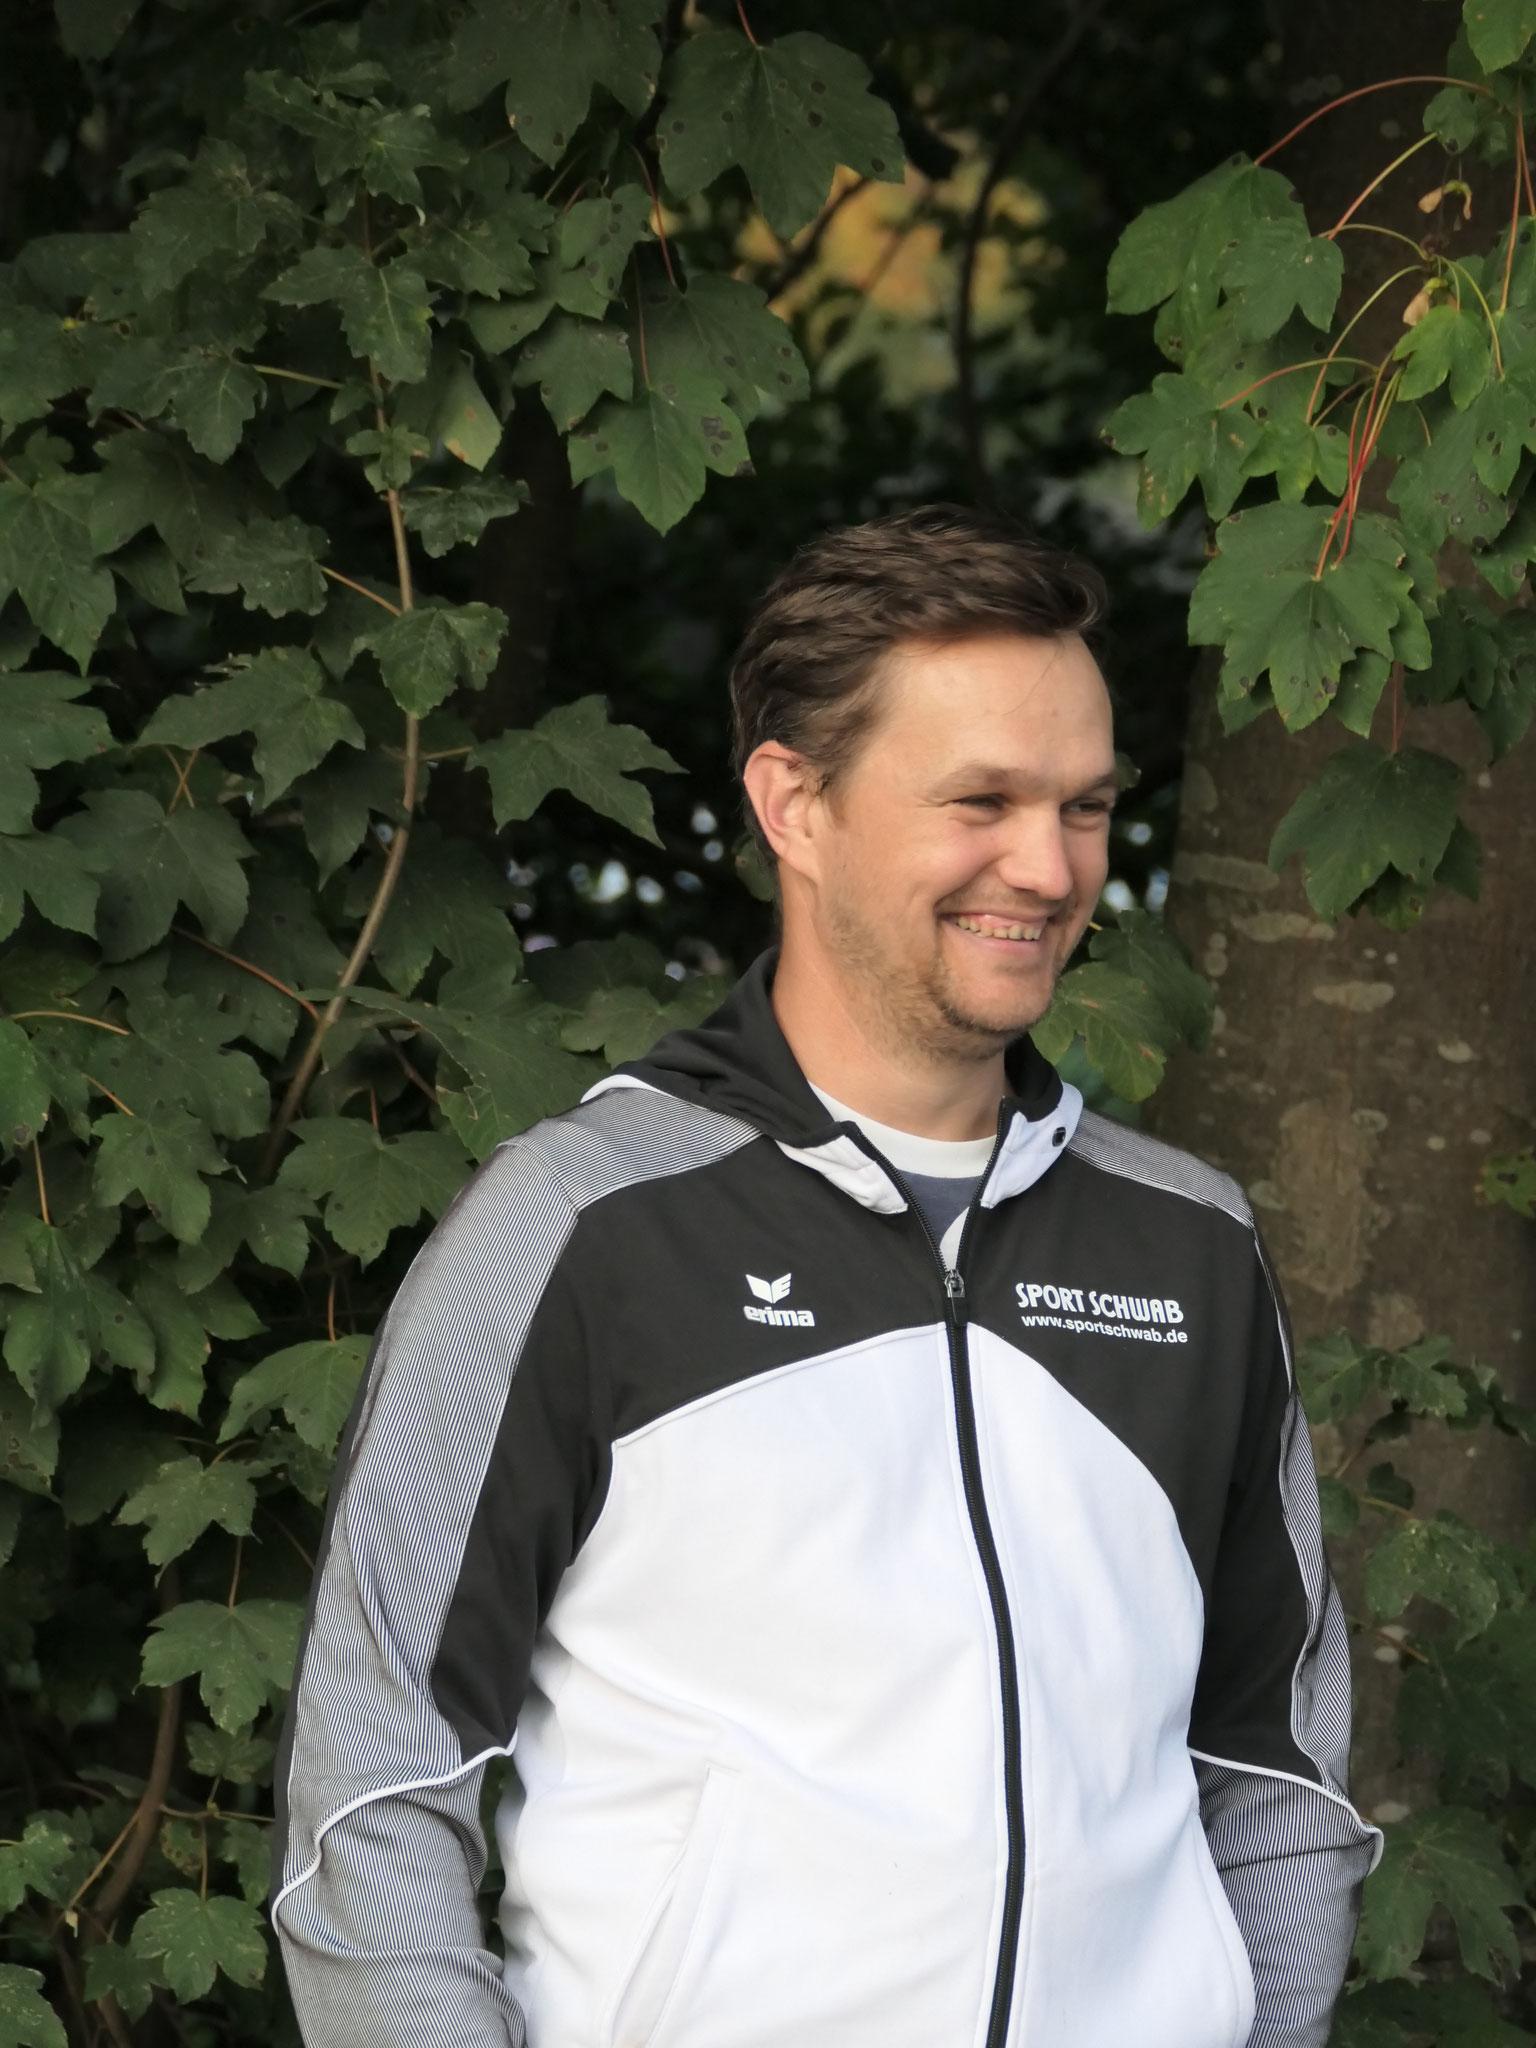 Volkmar Kersten - Förderteam, Einzel, Doppel - Organisation - Turnen